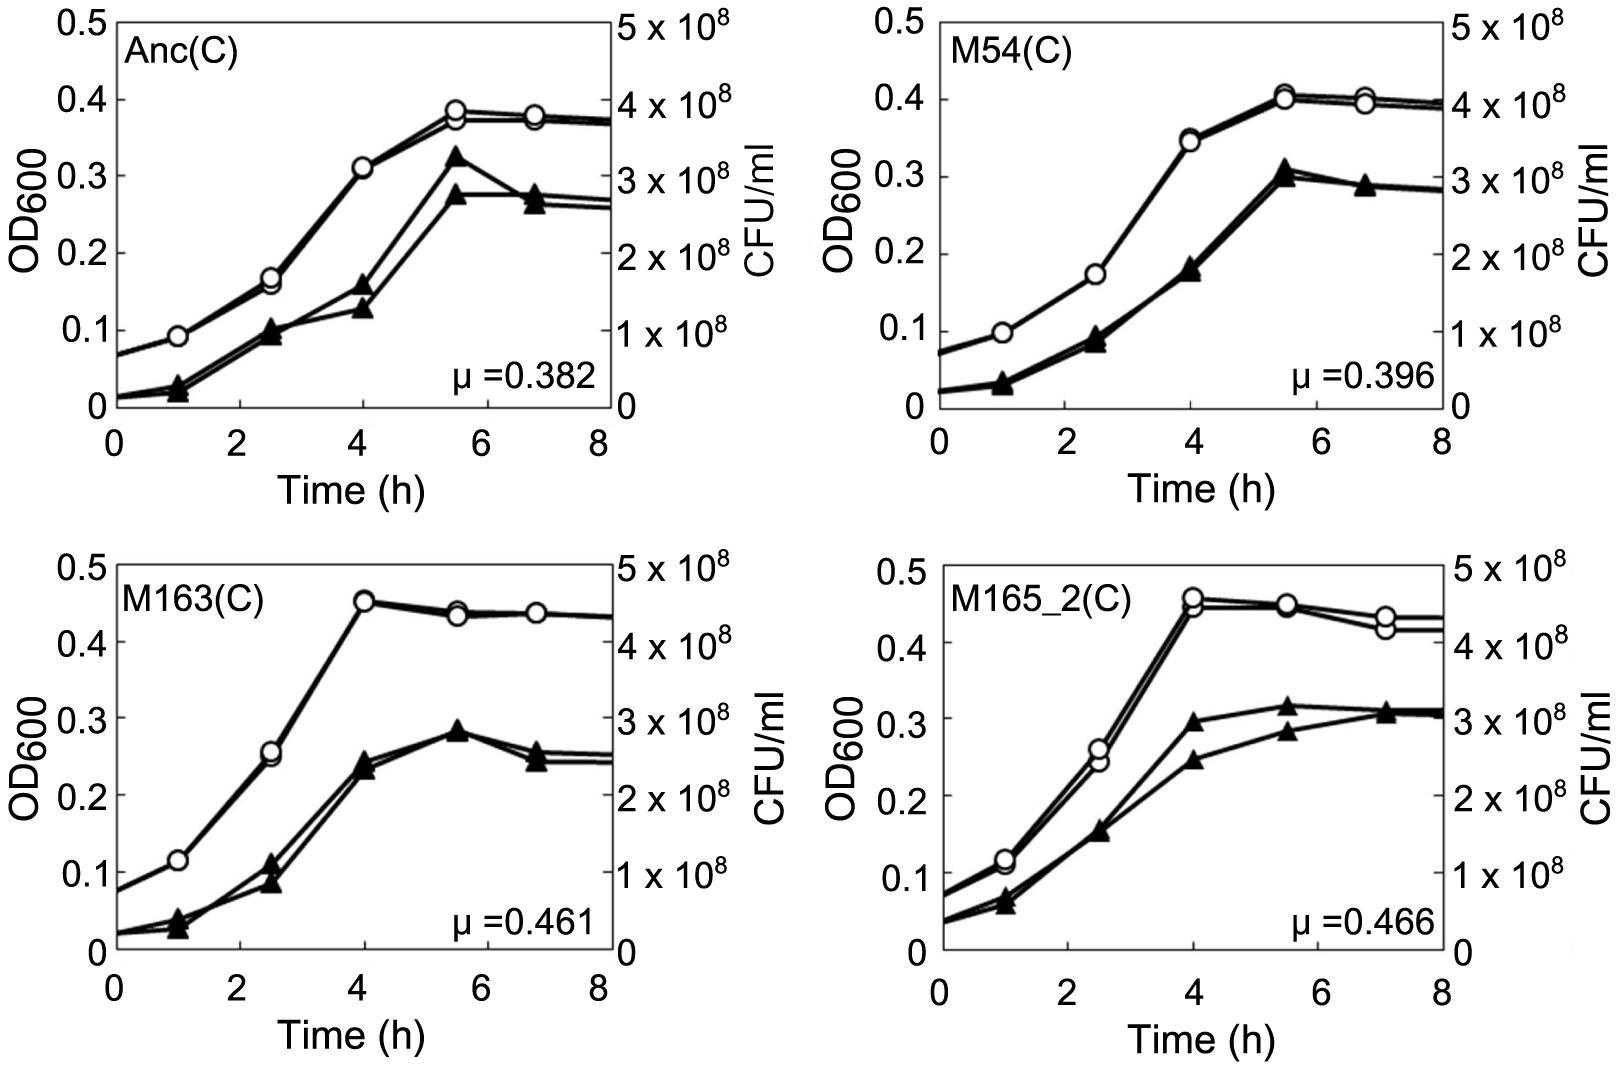 Growth curves of ancestral and evolved <i>E. coli</i>.